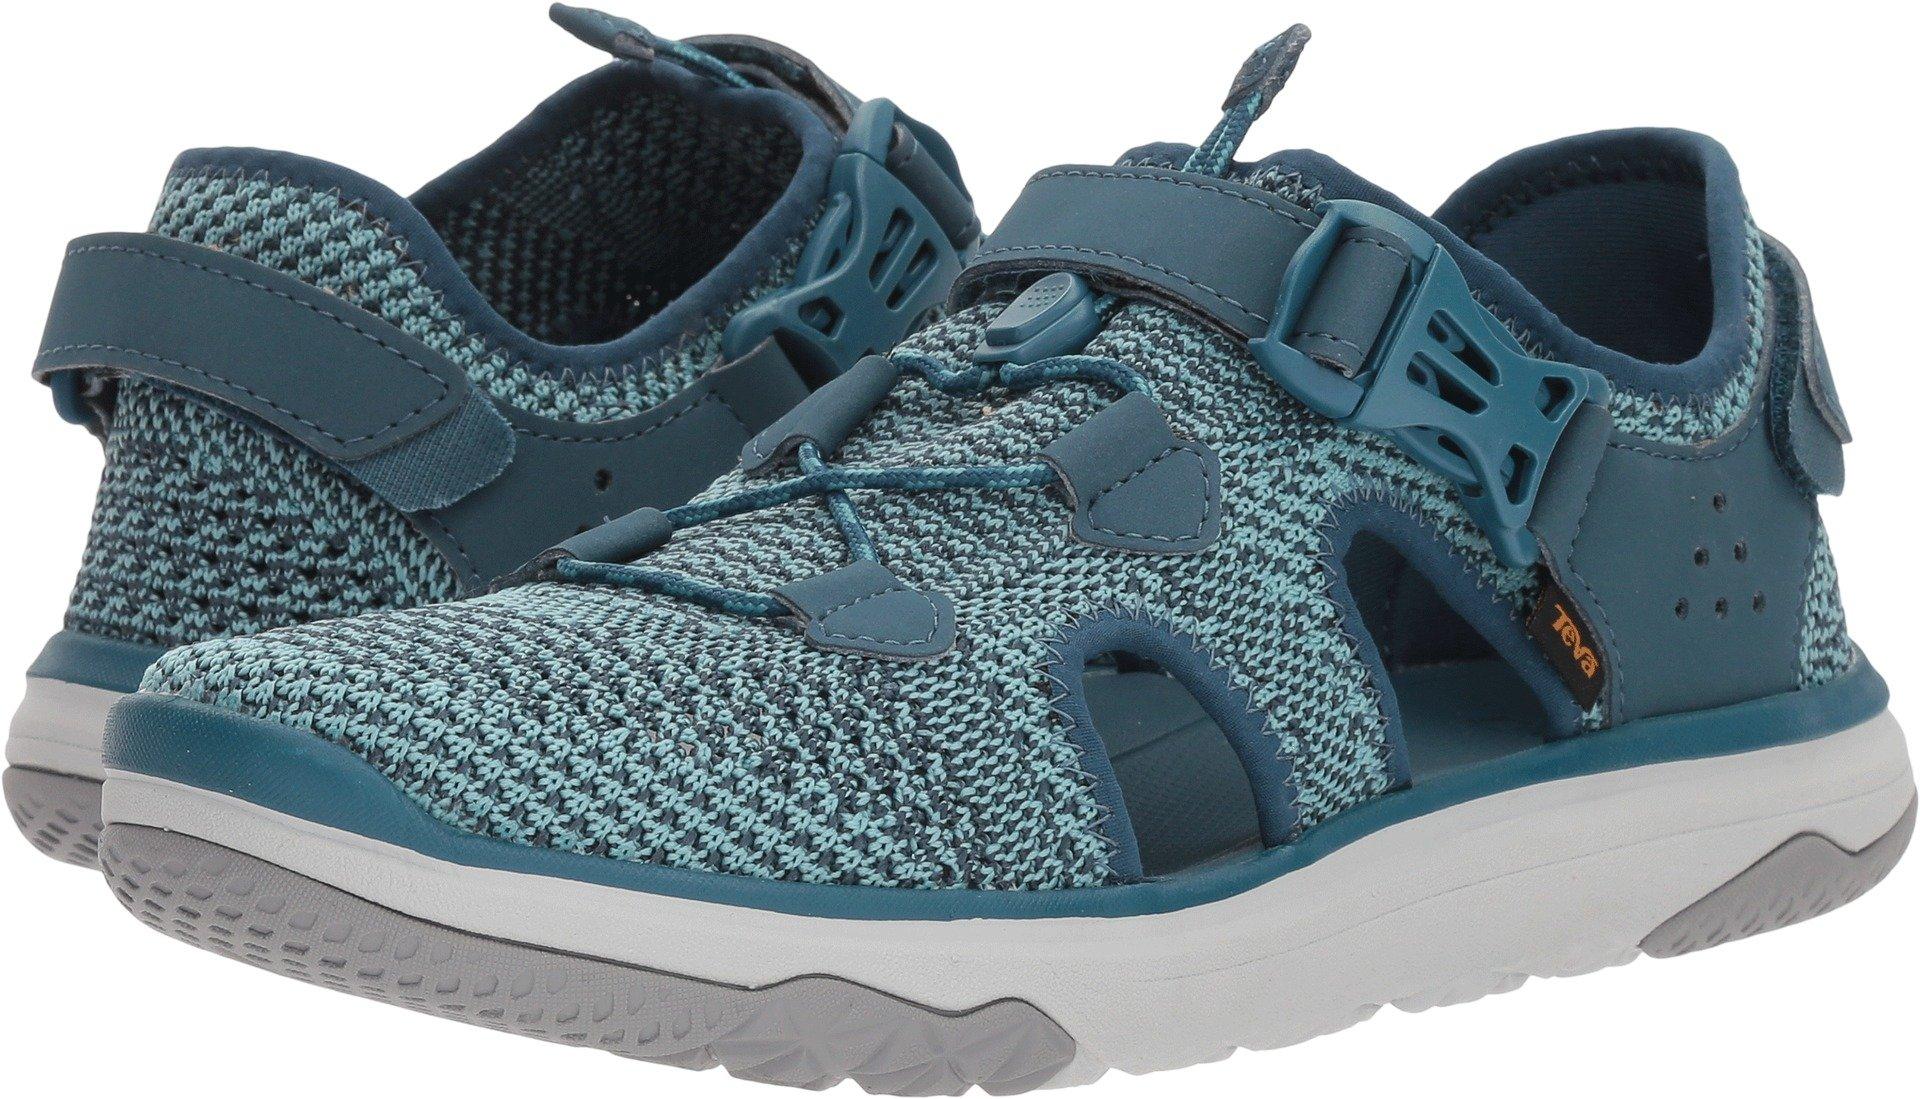 Teva Terra Float Travel Knit Legion Blue Womens Sporty Sandal Size 10M